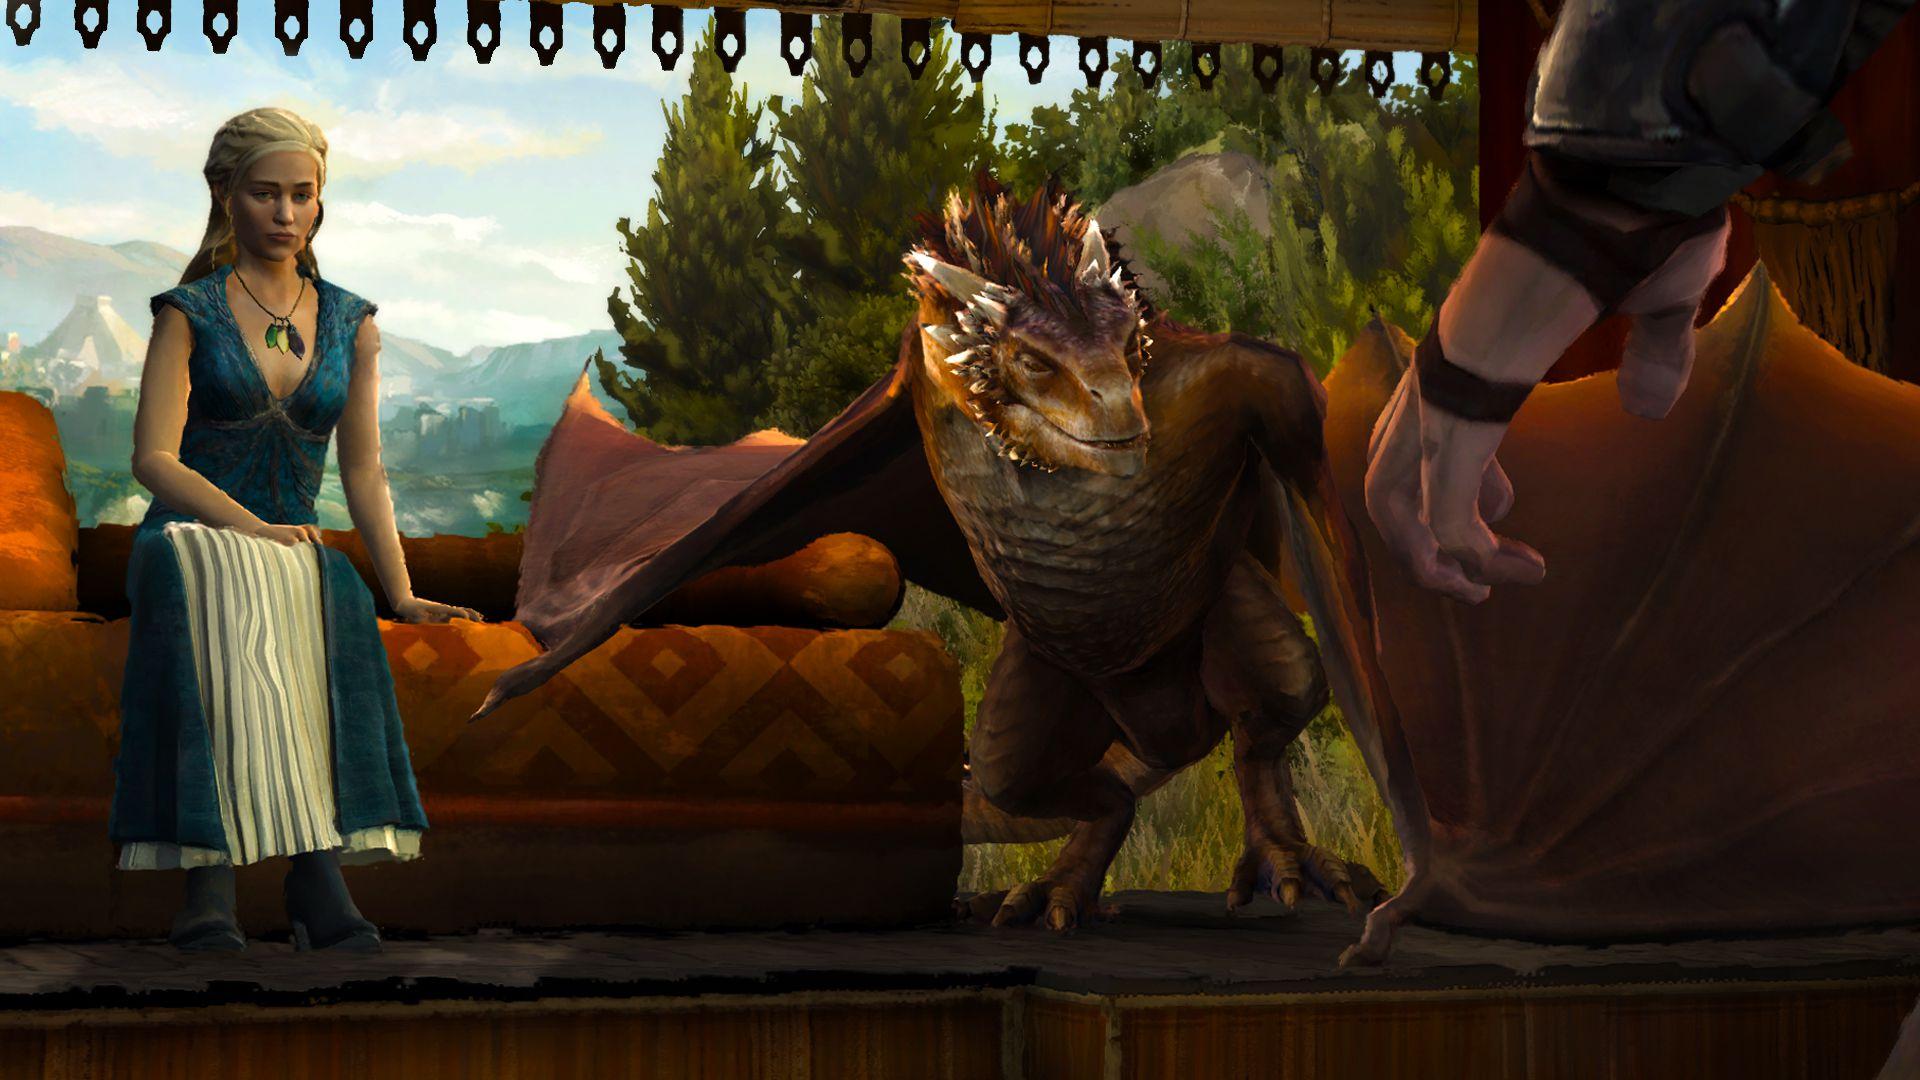 Game of Thrones: A Telltale Games Series Captura 3